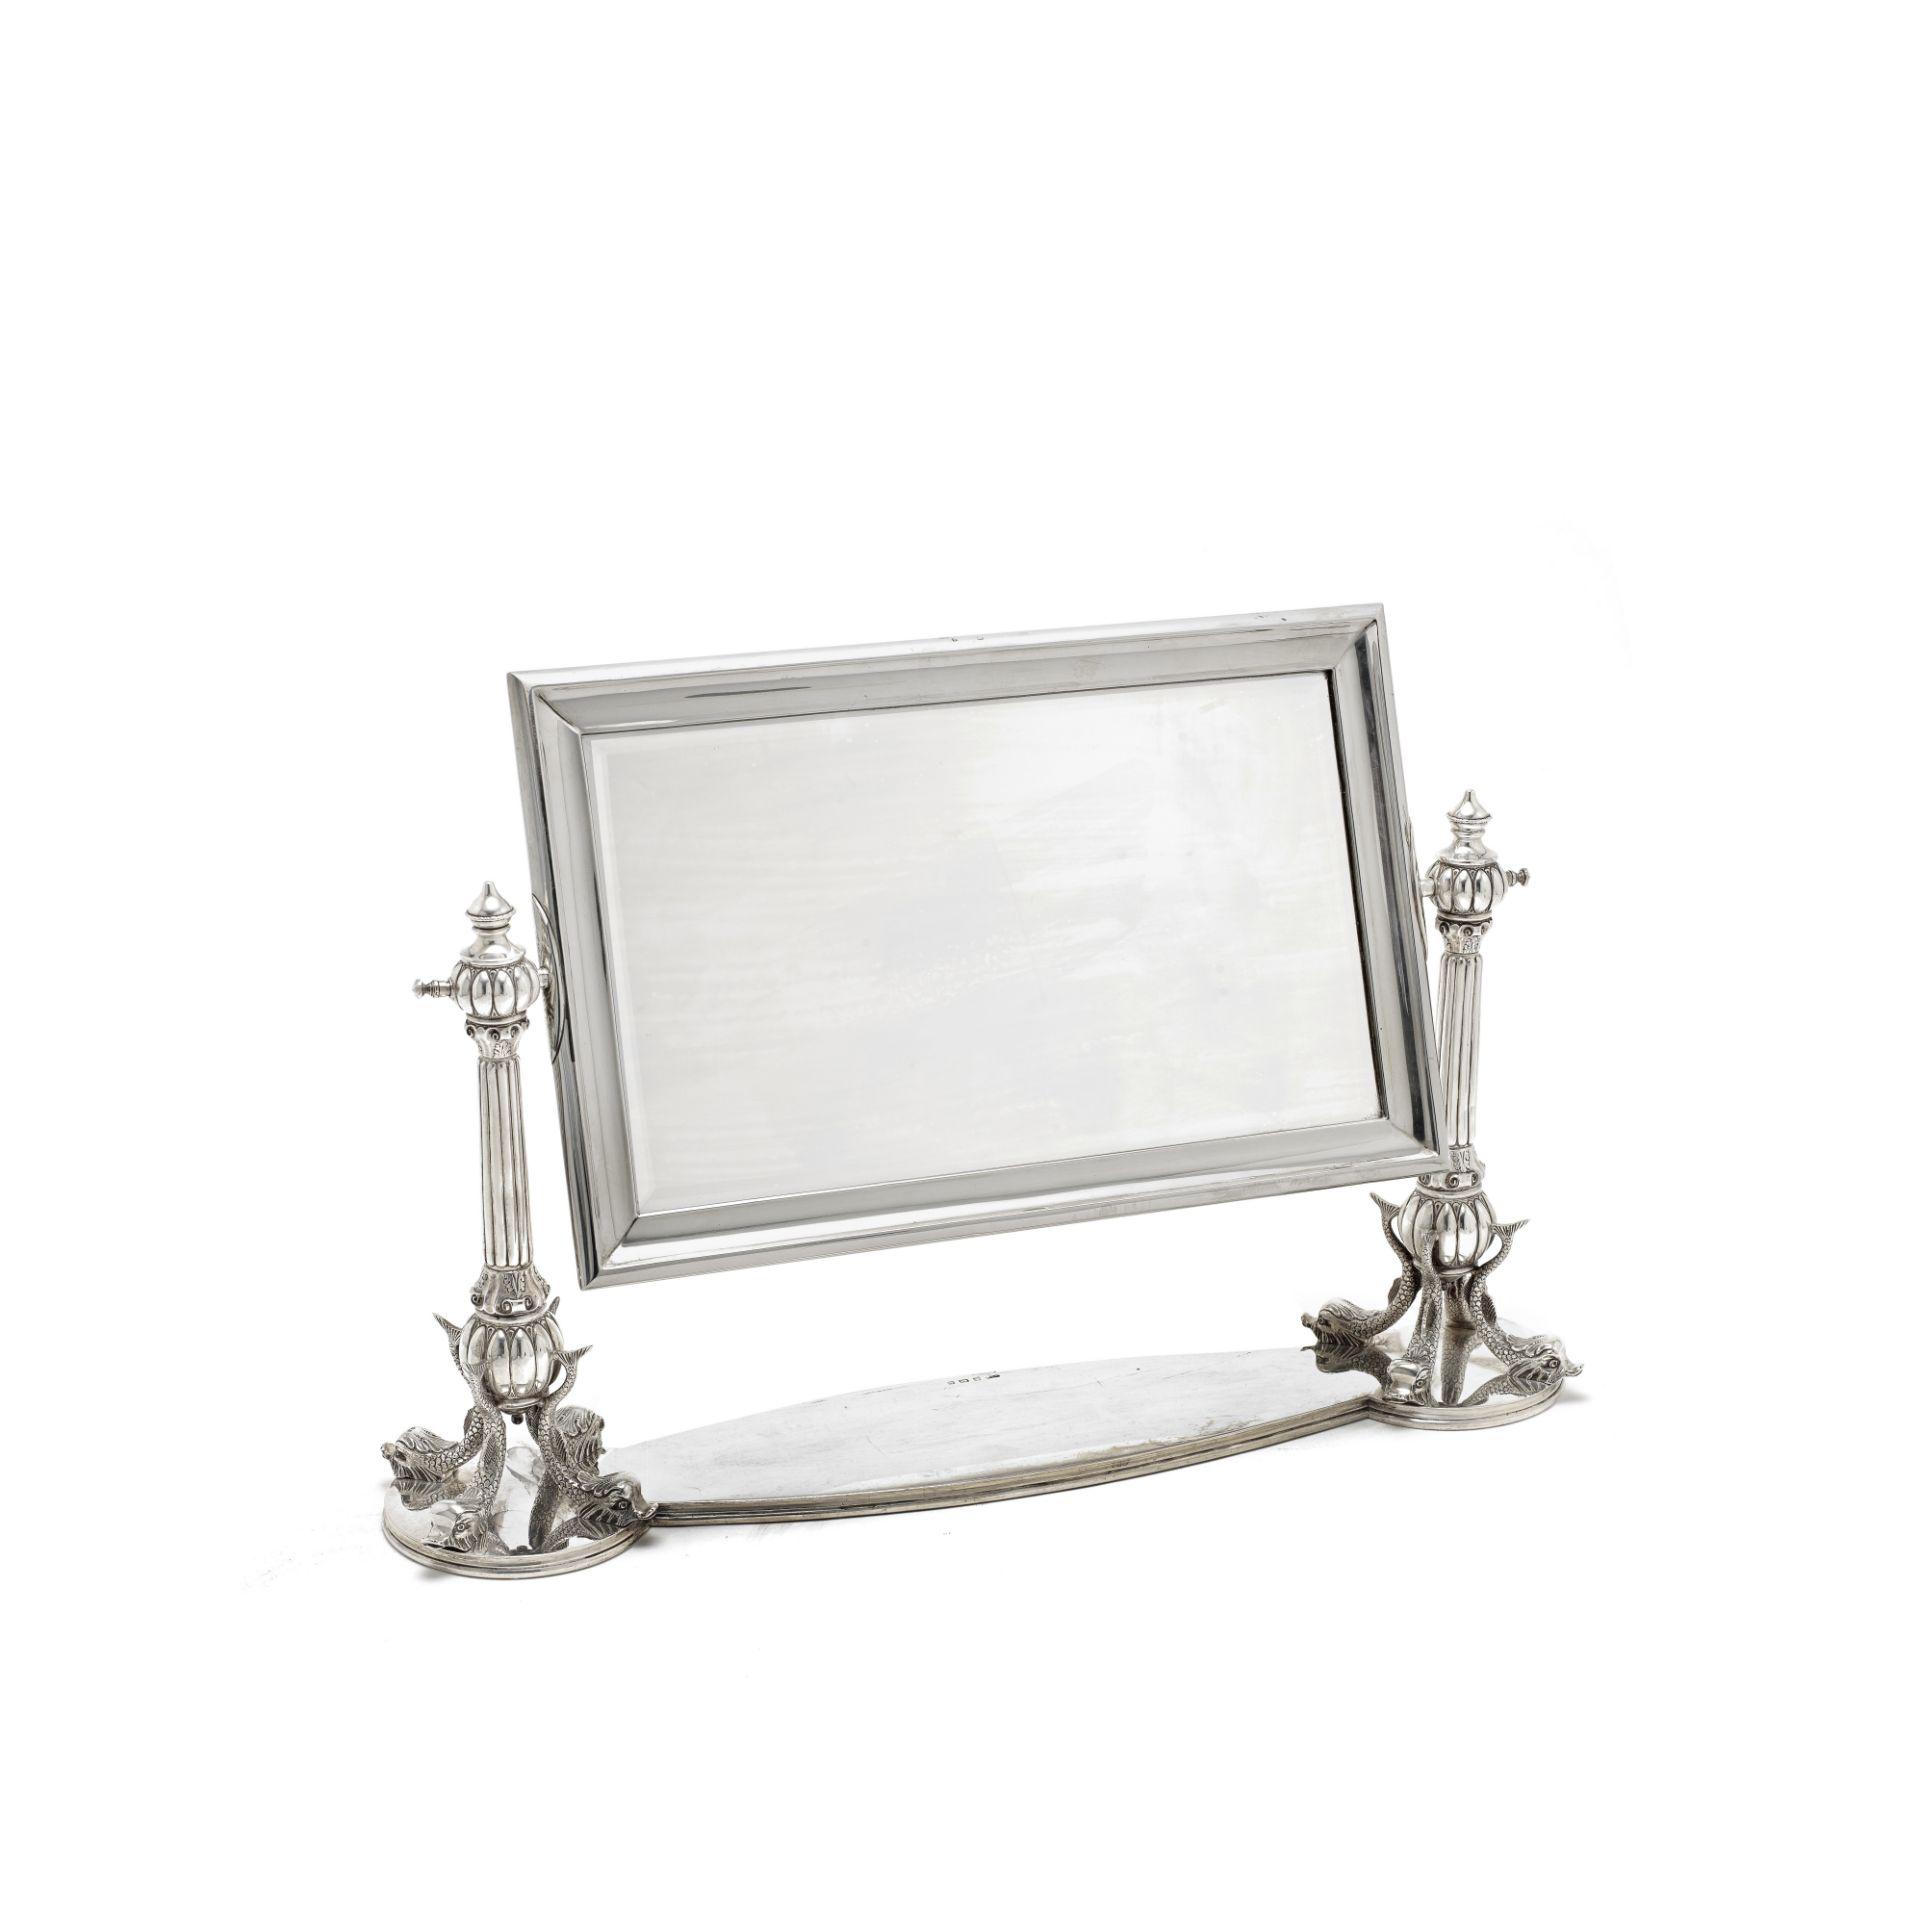 A silver dressing table mirror Sanders & Mackenzie, Birmingham 1926